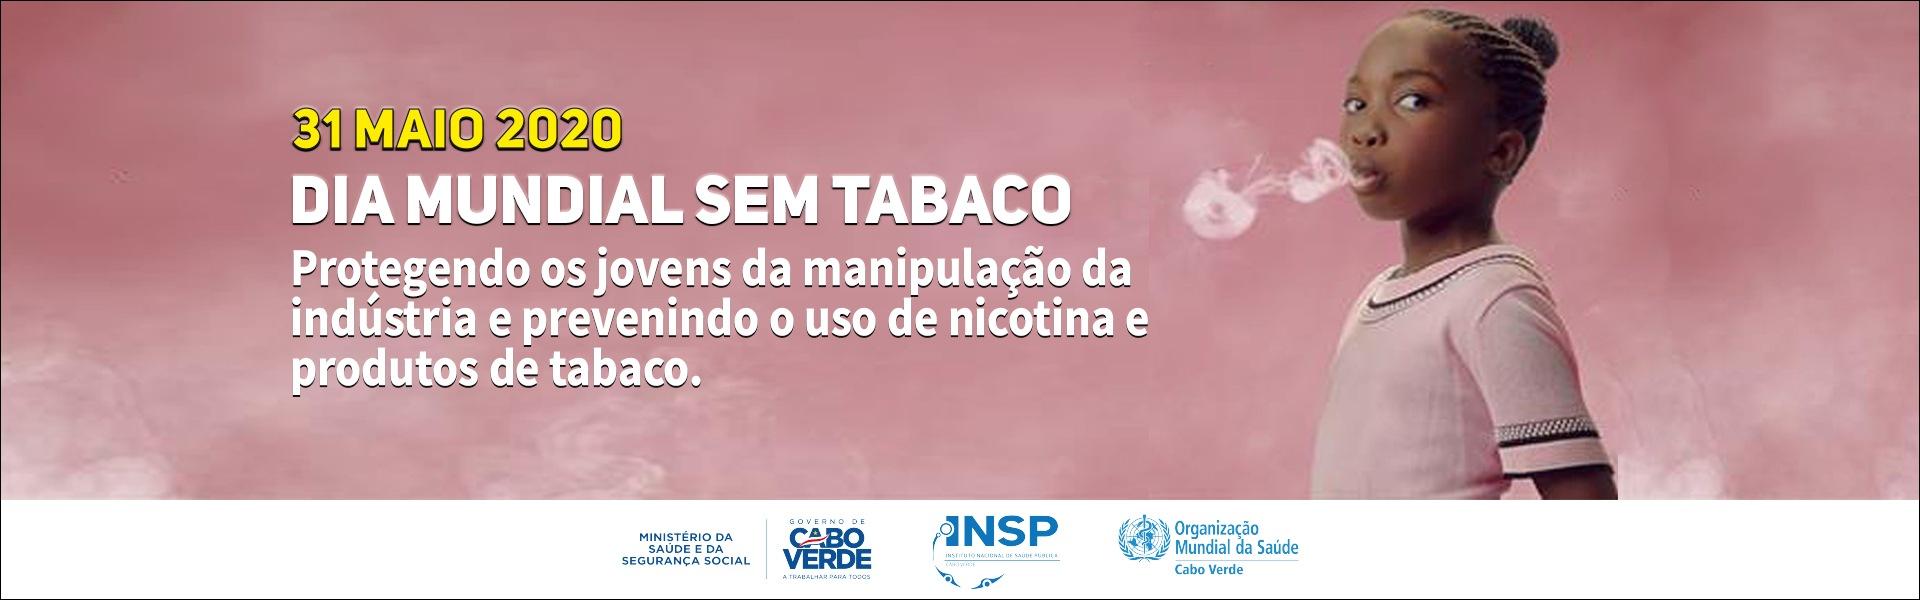 Banner Dia Mundial Sem Tabaco_Dia Mundial Sem Tabaco